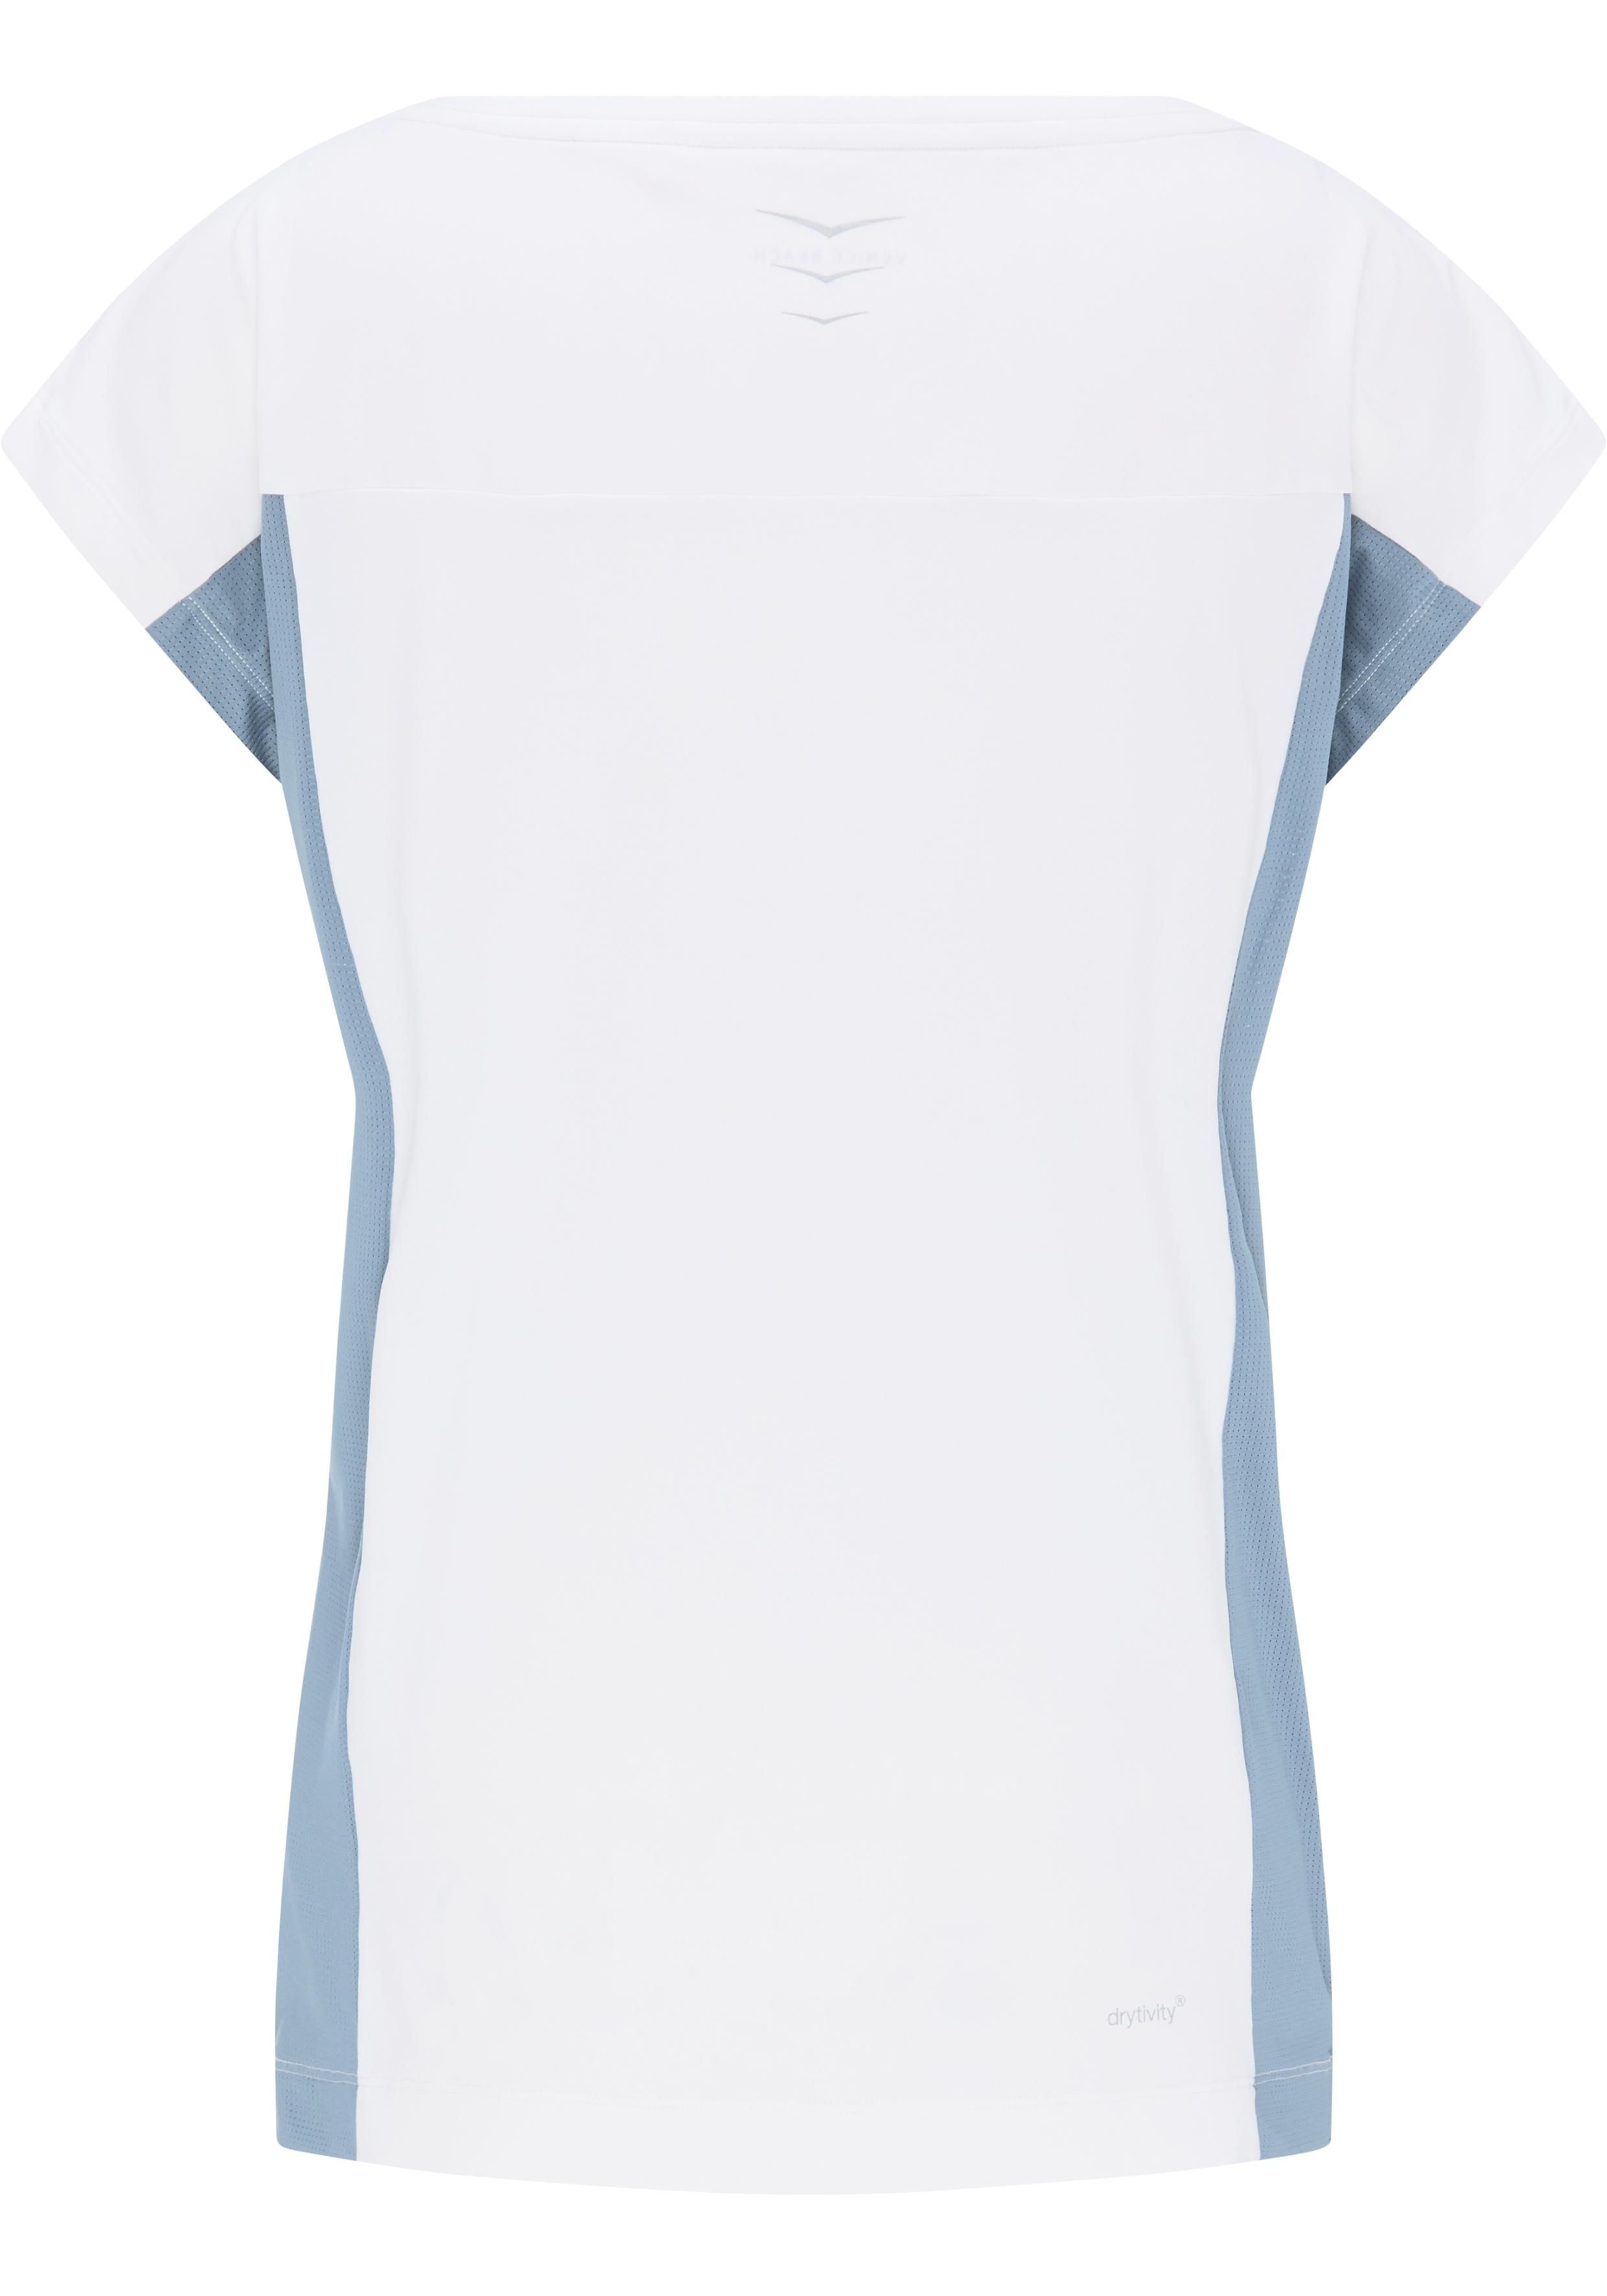 Venice Bach Damen Cadence DL01 T-Shirt 15815 weiß-blaugrau